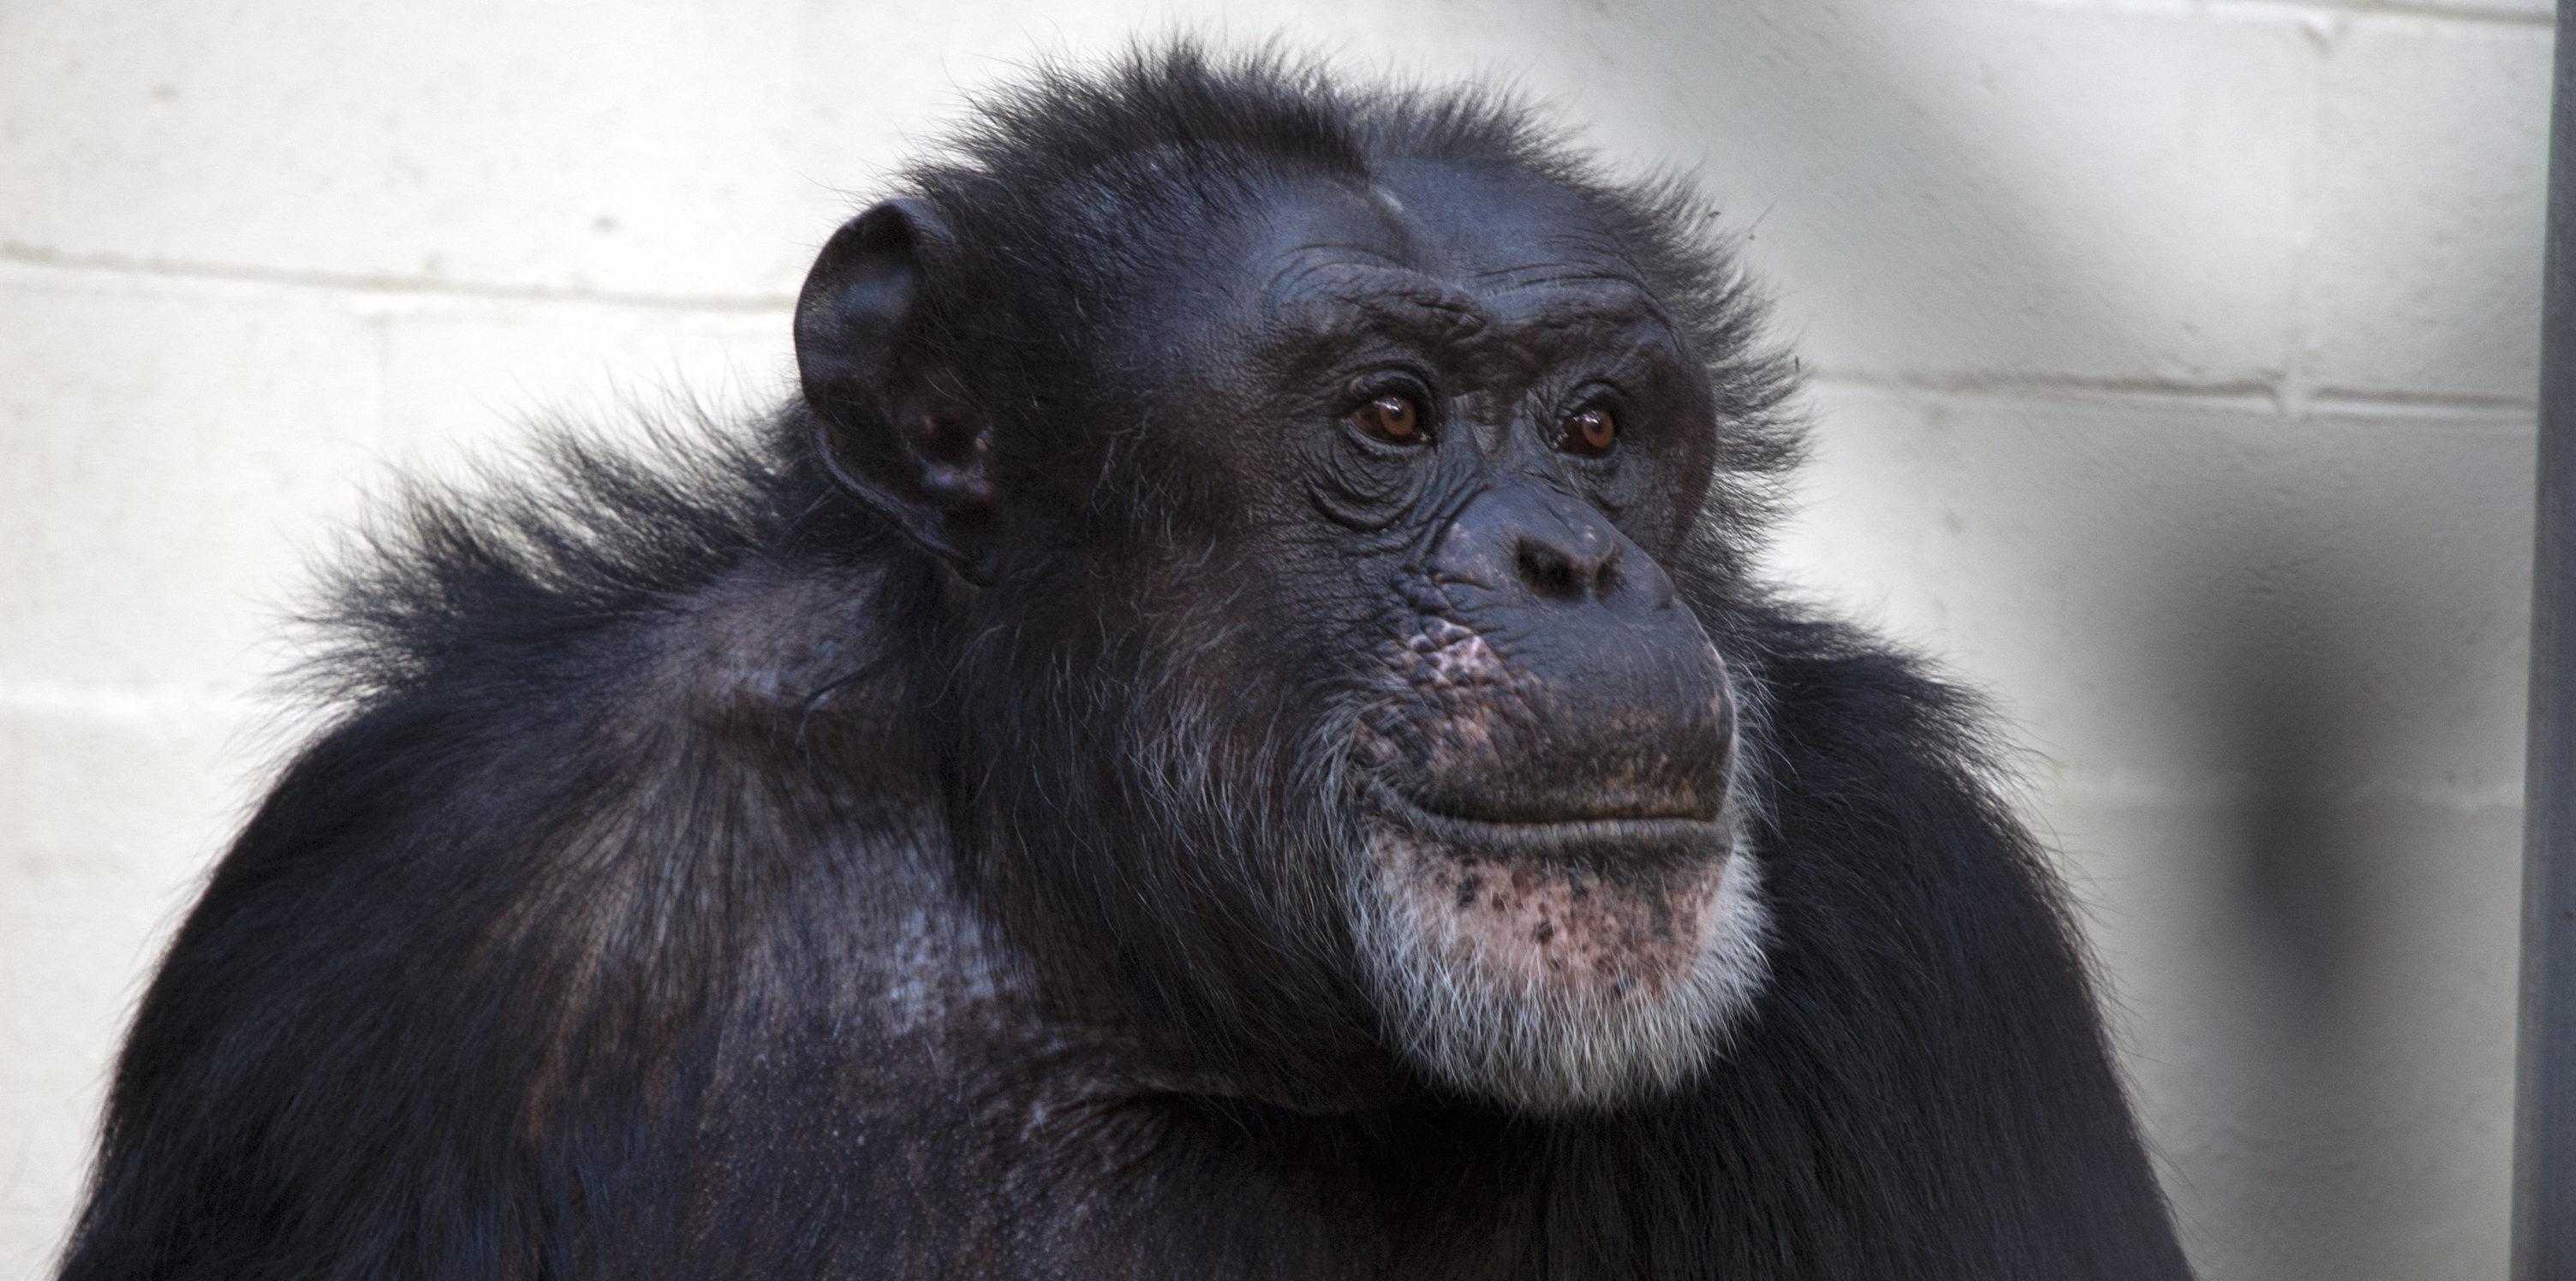 У шимпанзе обнаружили зачатки рефлексии